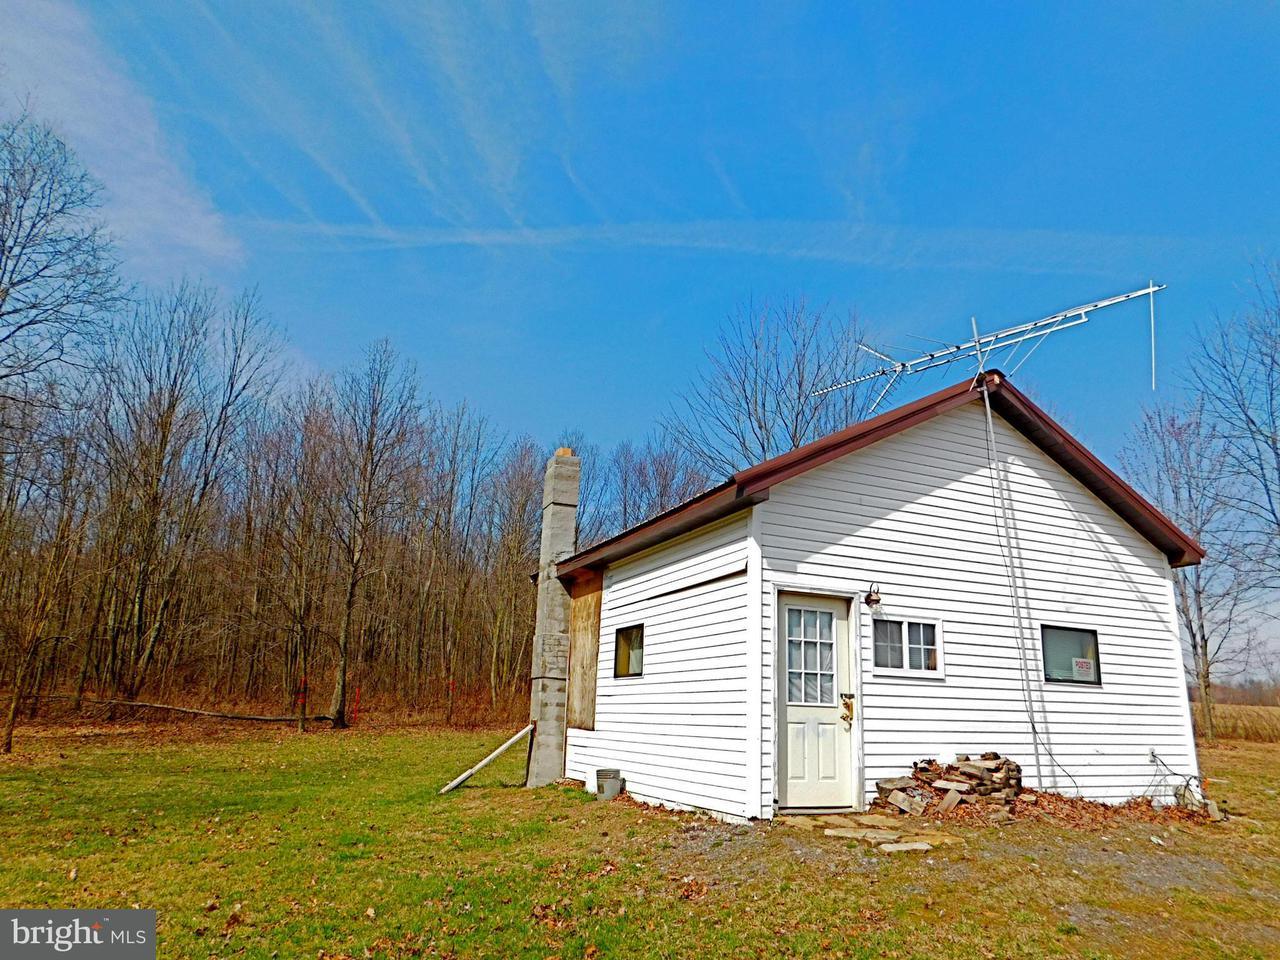 Land for Sale at Off Rt 1 Elk Garden, West Virginia 26717 United States